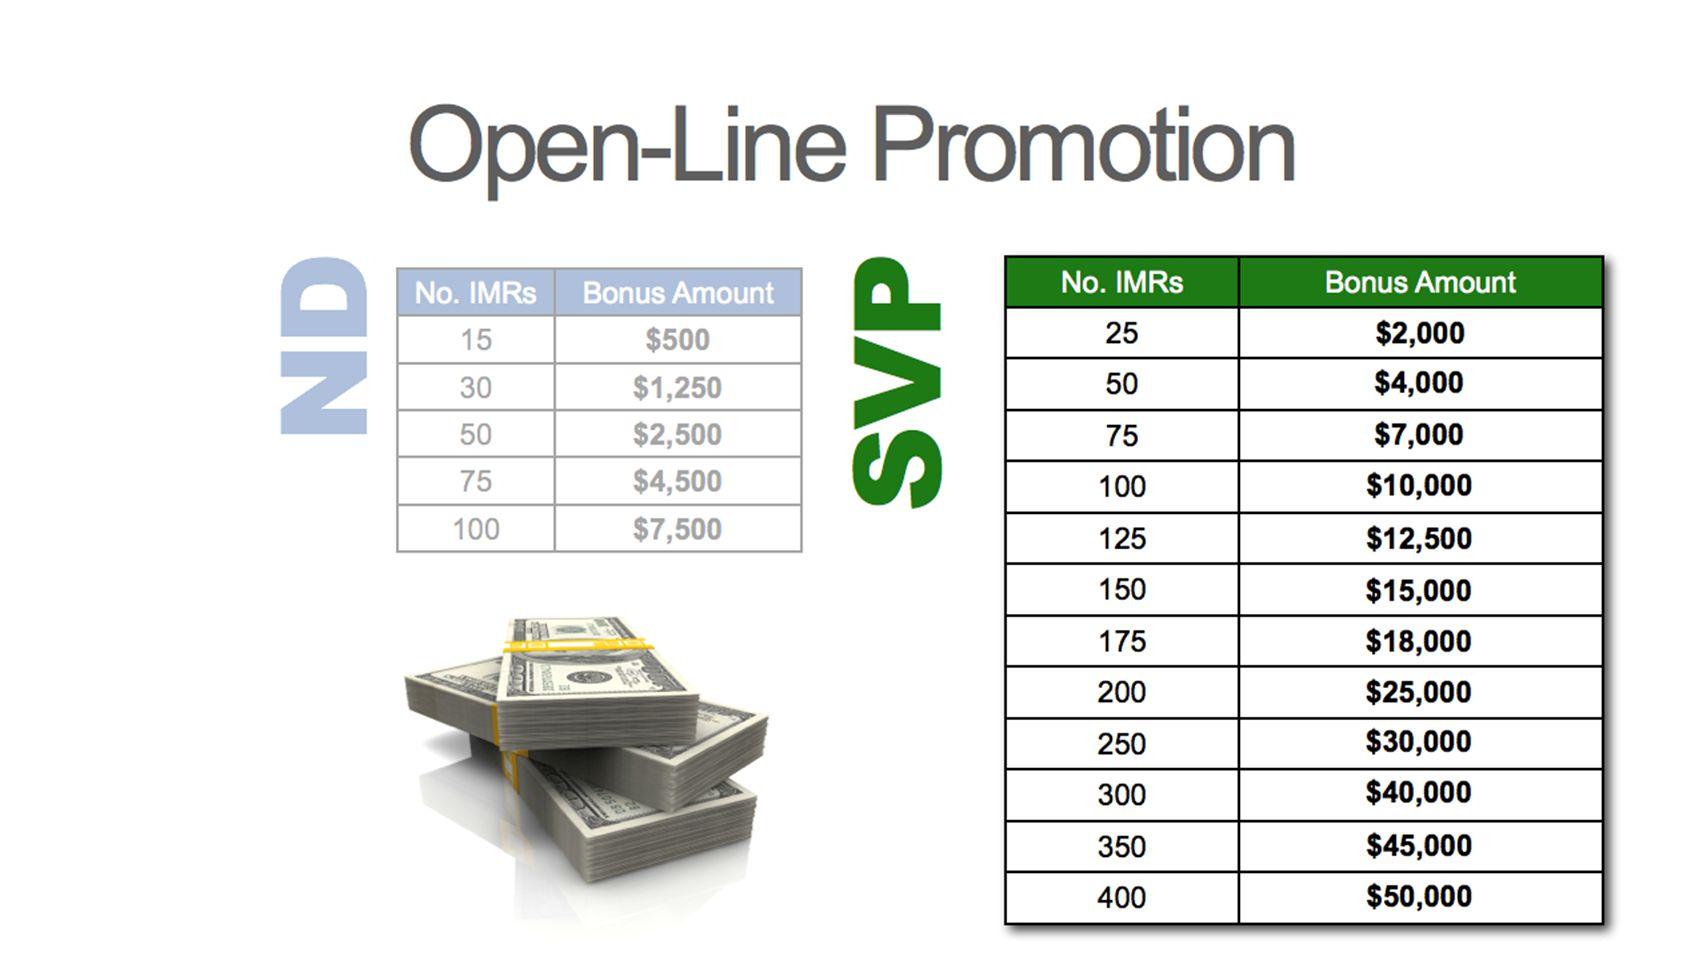 ND Open-Line Promotion No. IMRs Bonus Amount 15 30 50 75 100 $500